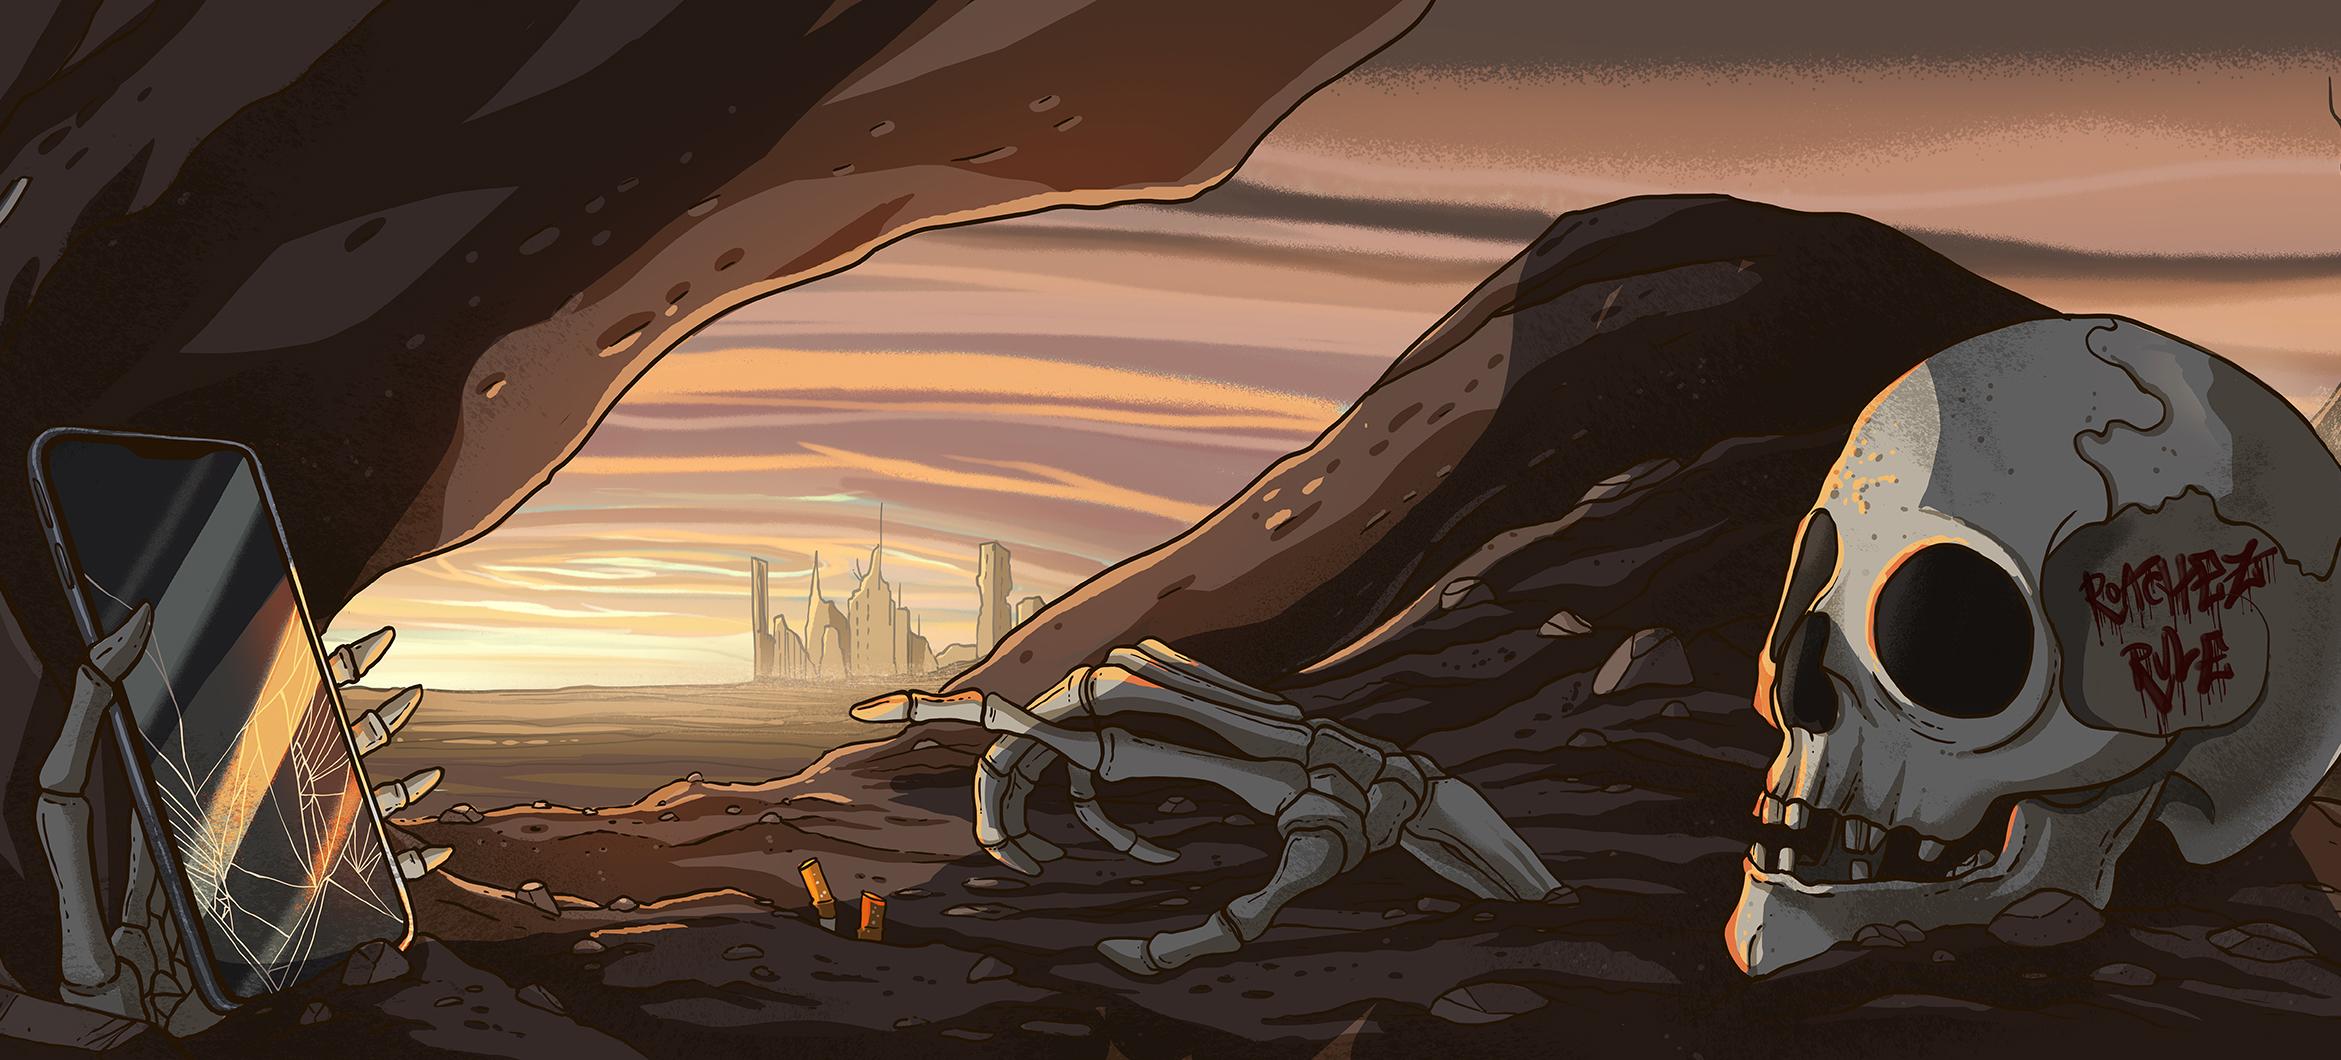 kirra-prkki-background-apocalypse